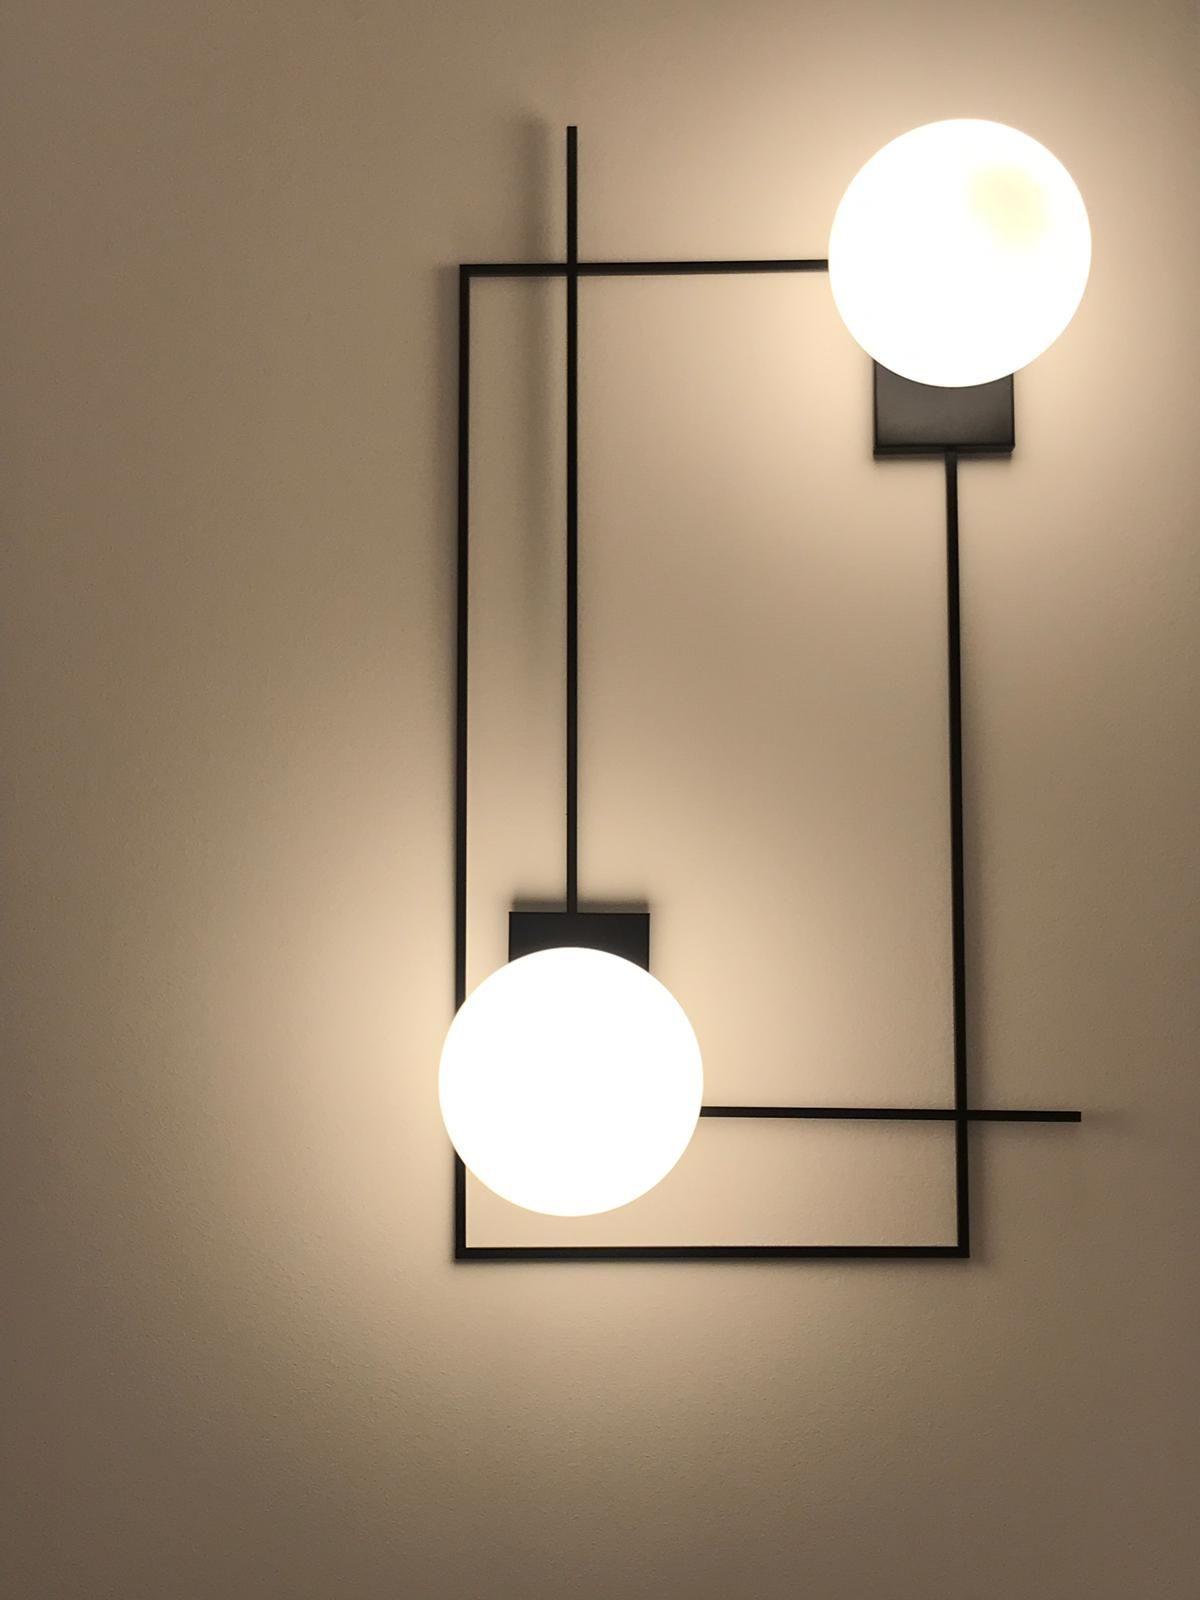 Vesoi Lighting Lamps Living Room Wall Lamp Lighting